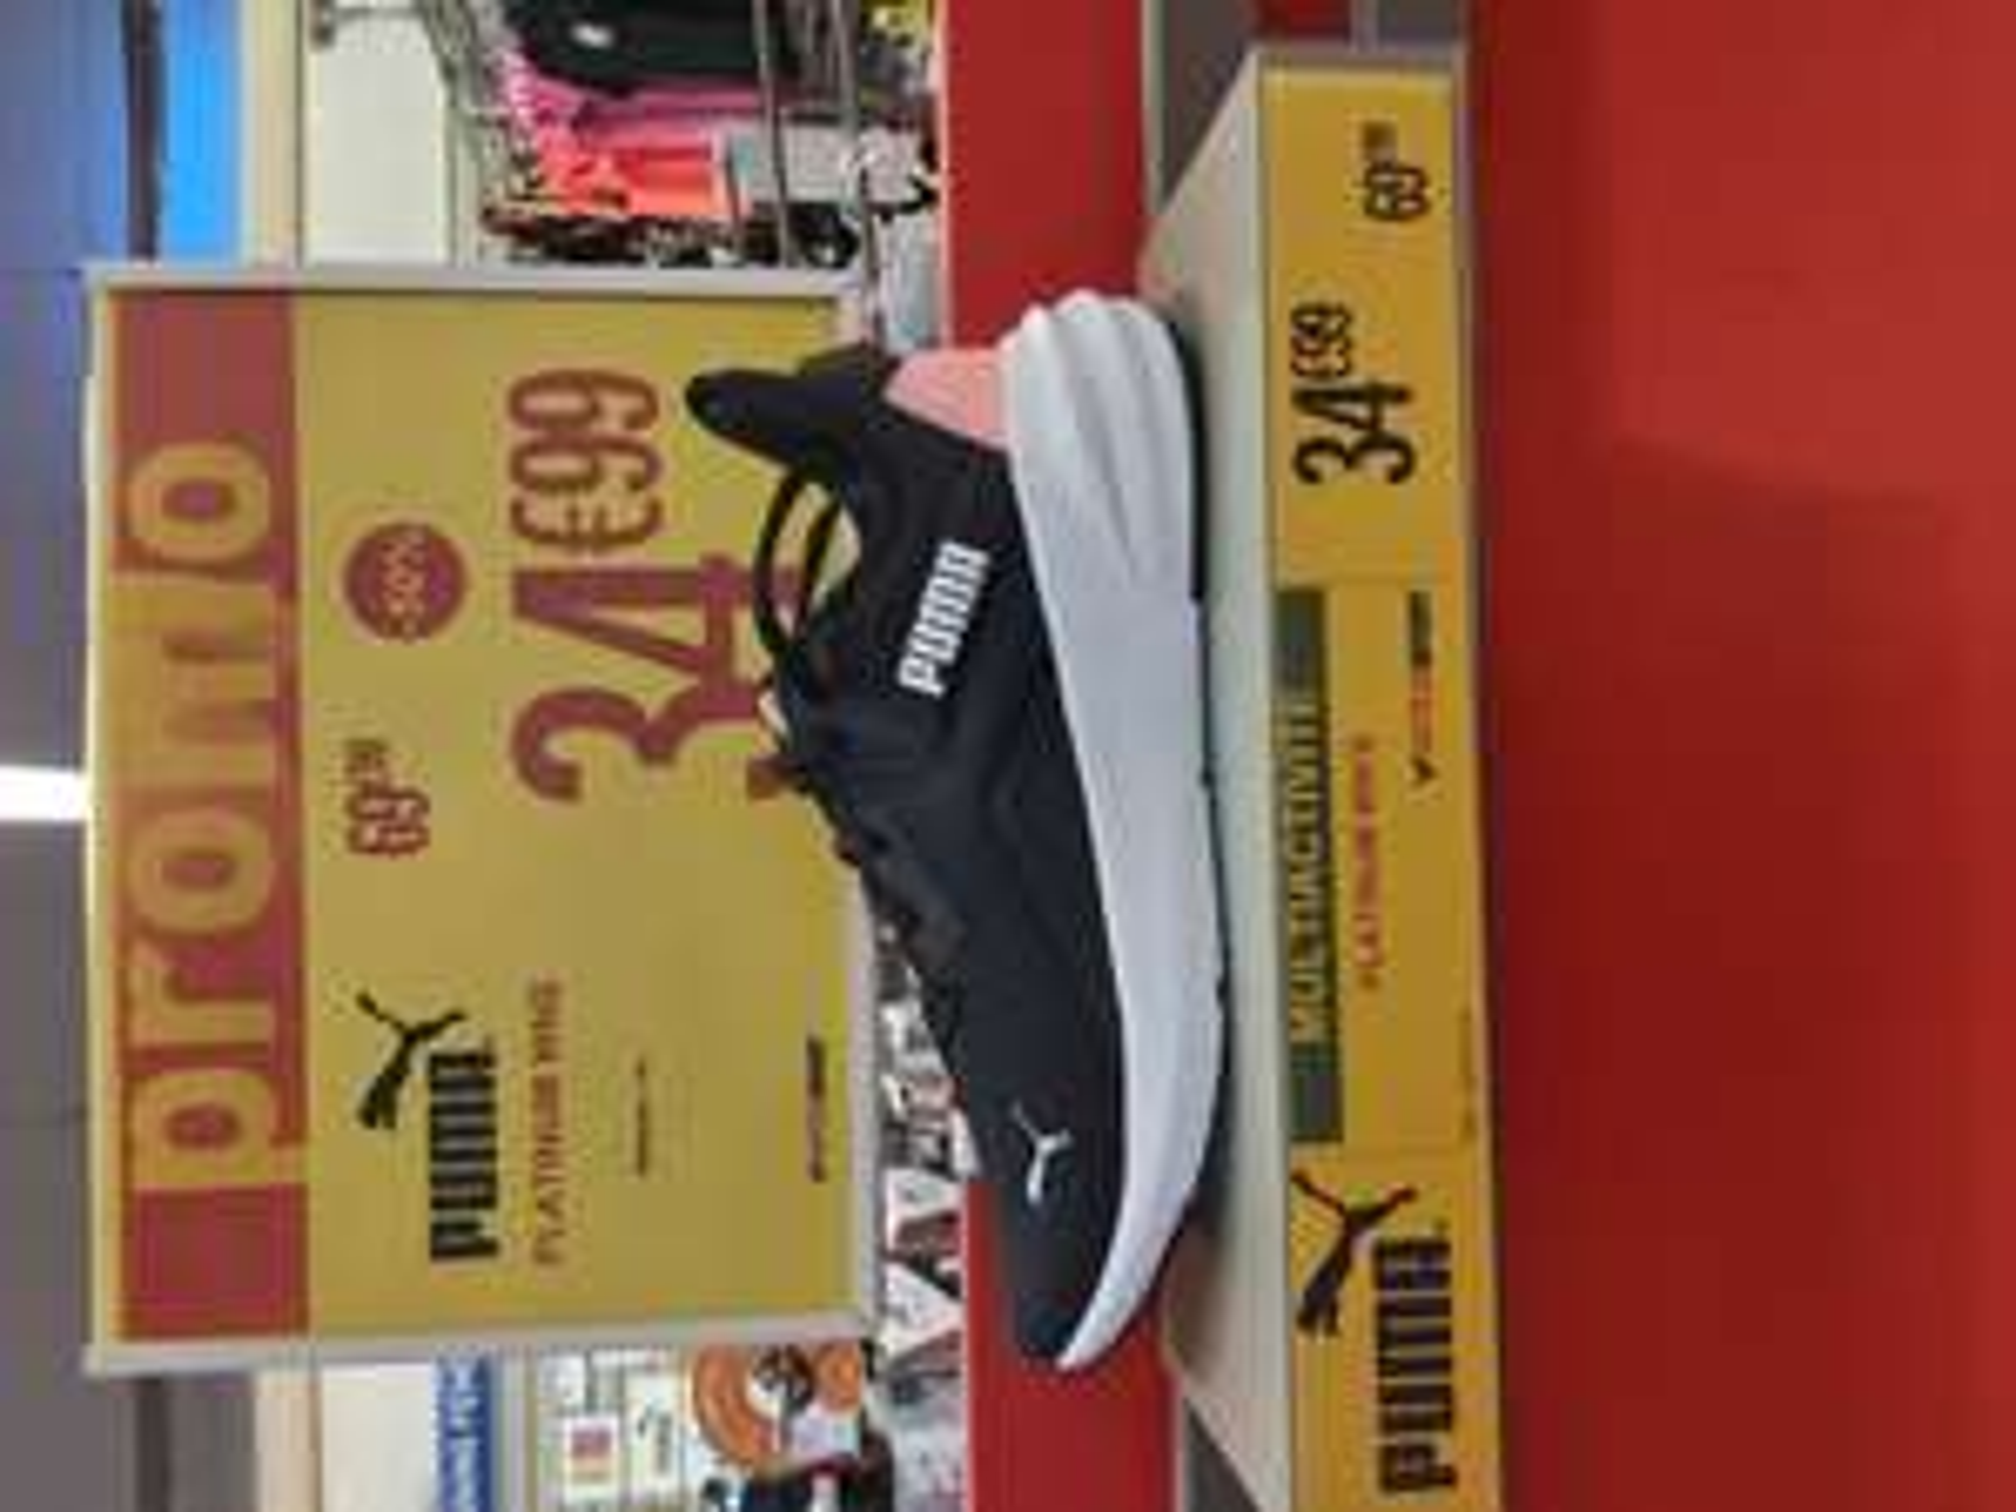 Chaussures Puma Platinum Wn's (tailles 37, 38 ou 39) - Pessac (33)